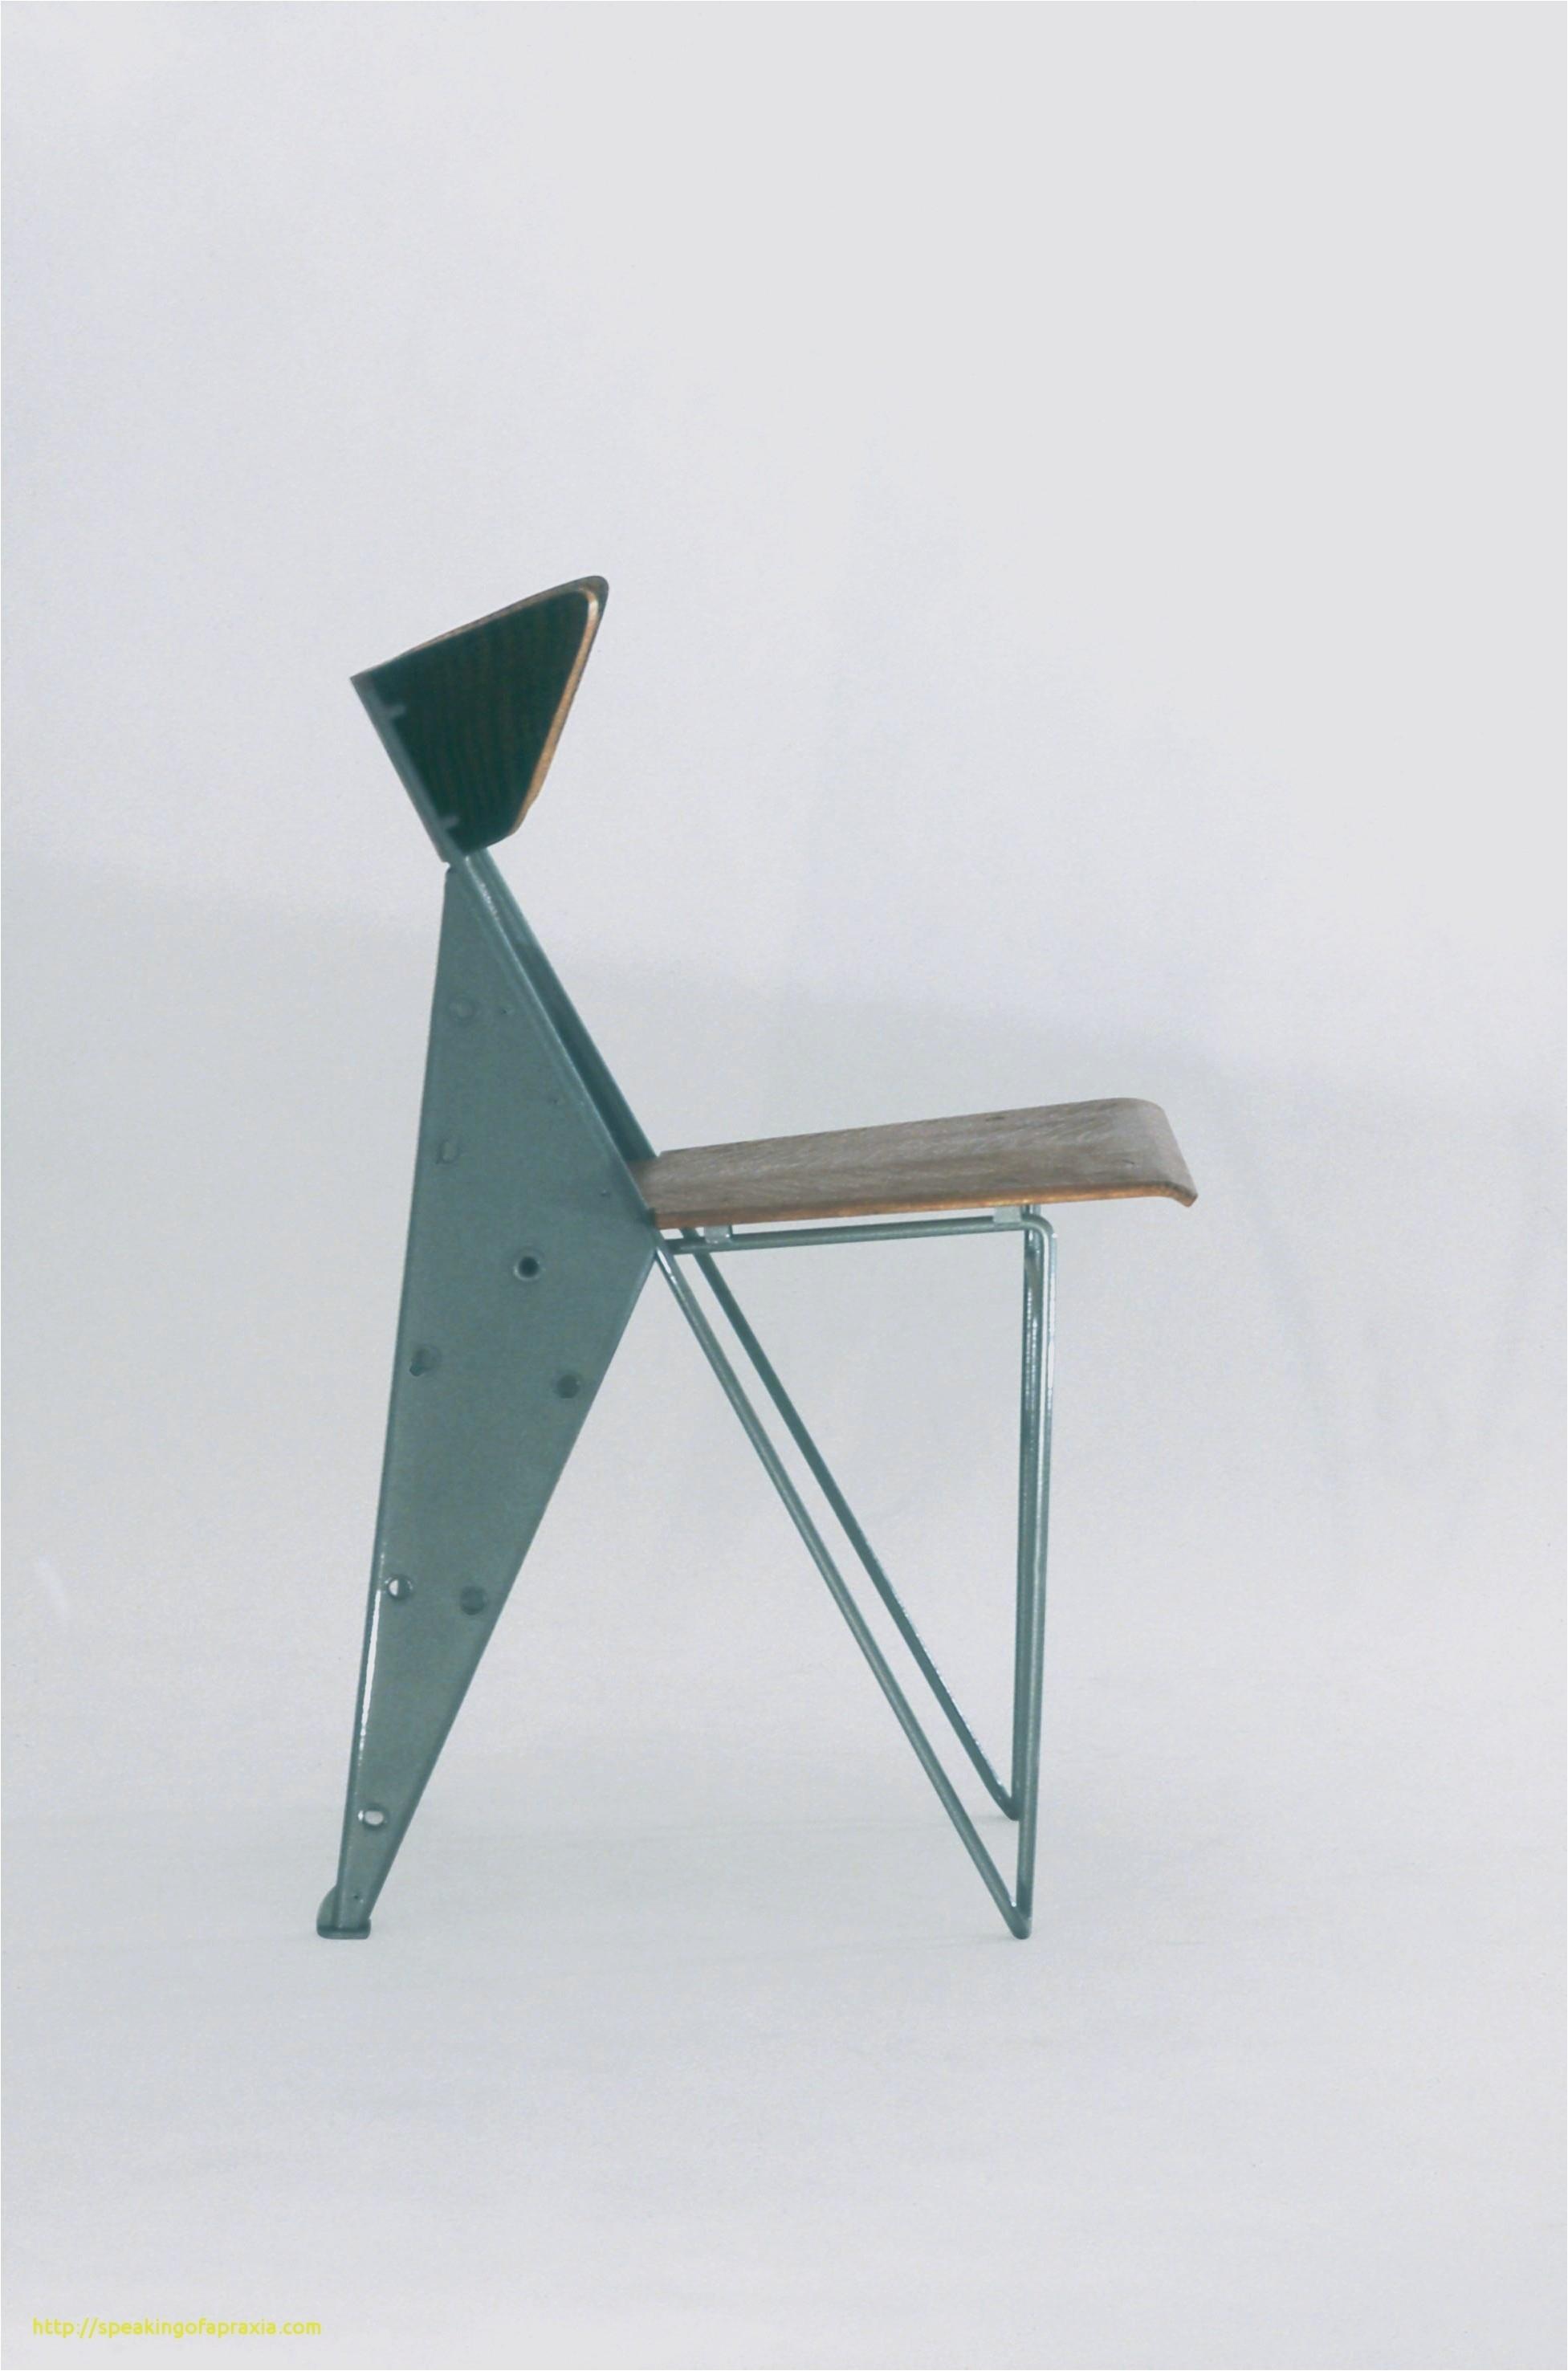 Chaise Pliante Foir Fouille Frais Stock Chaise Pliante Foir Fouille Unique Chaise Pliante Foir Fouille Beau